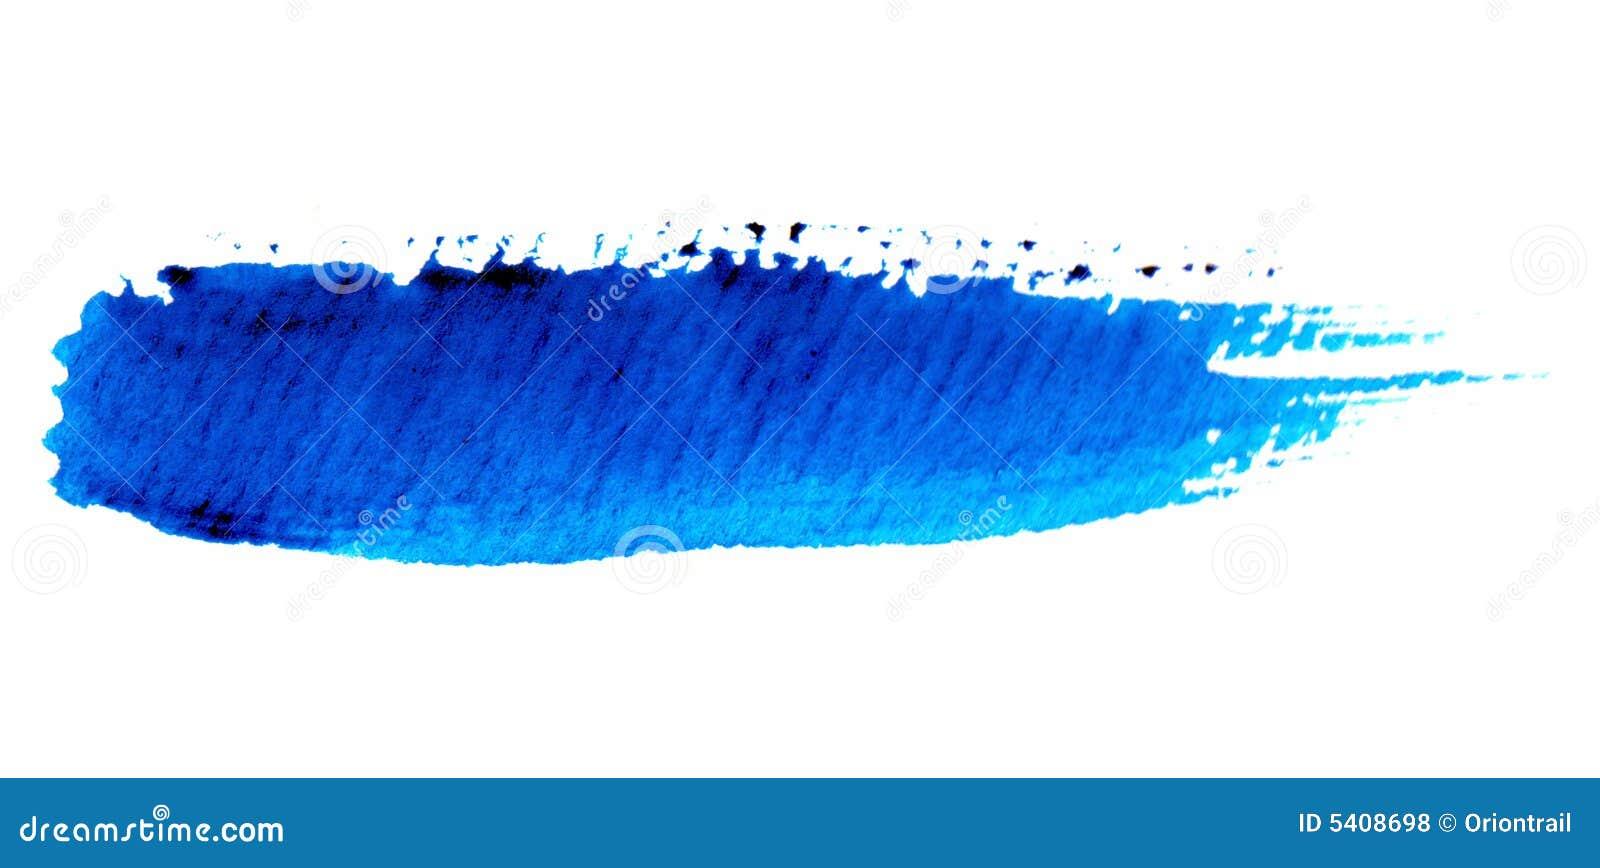 brush stroke stock illustration illustration of drop swoosh vector art swoosh vector free